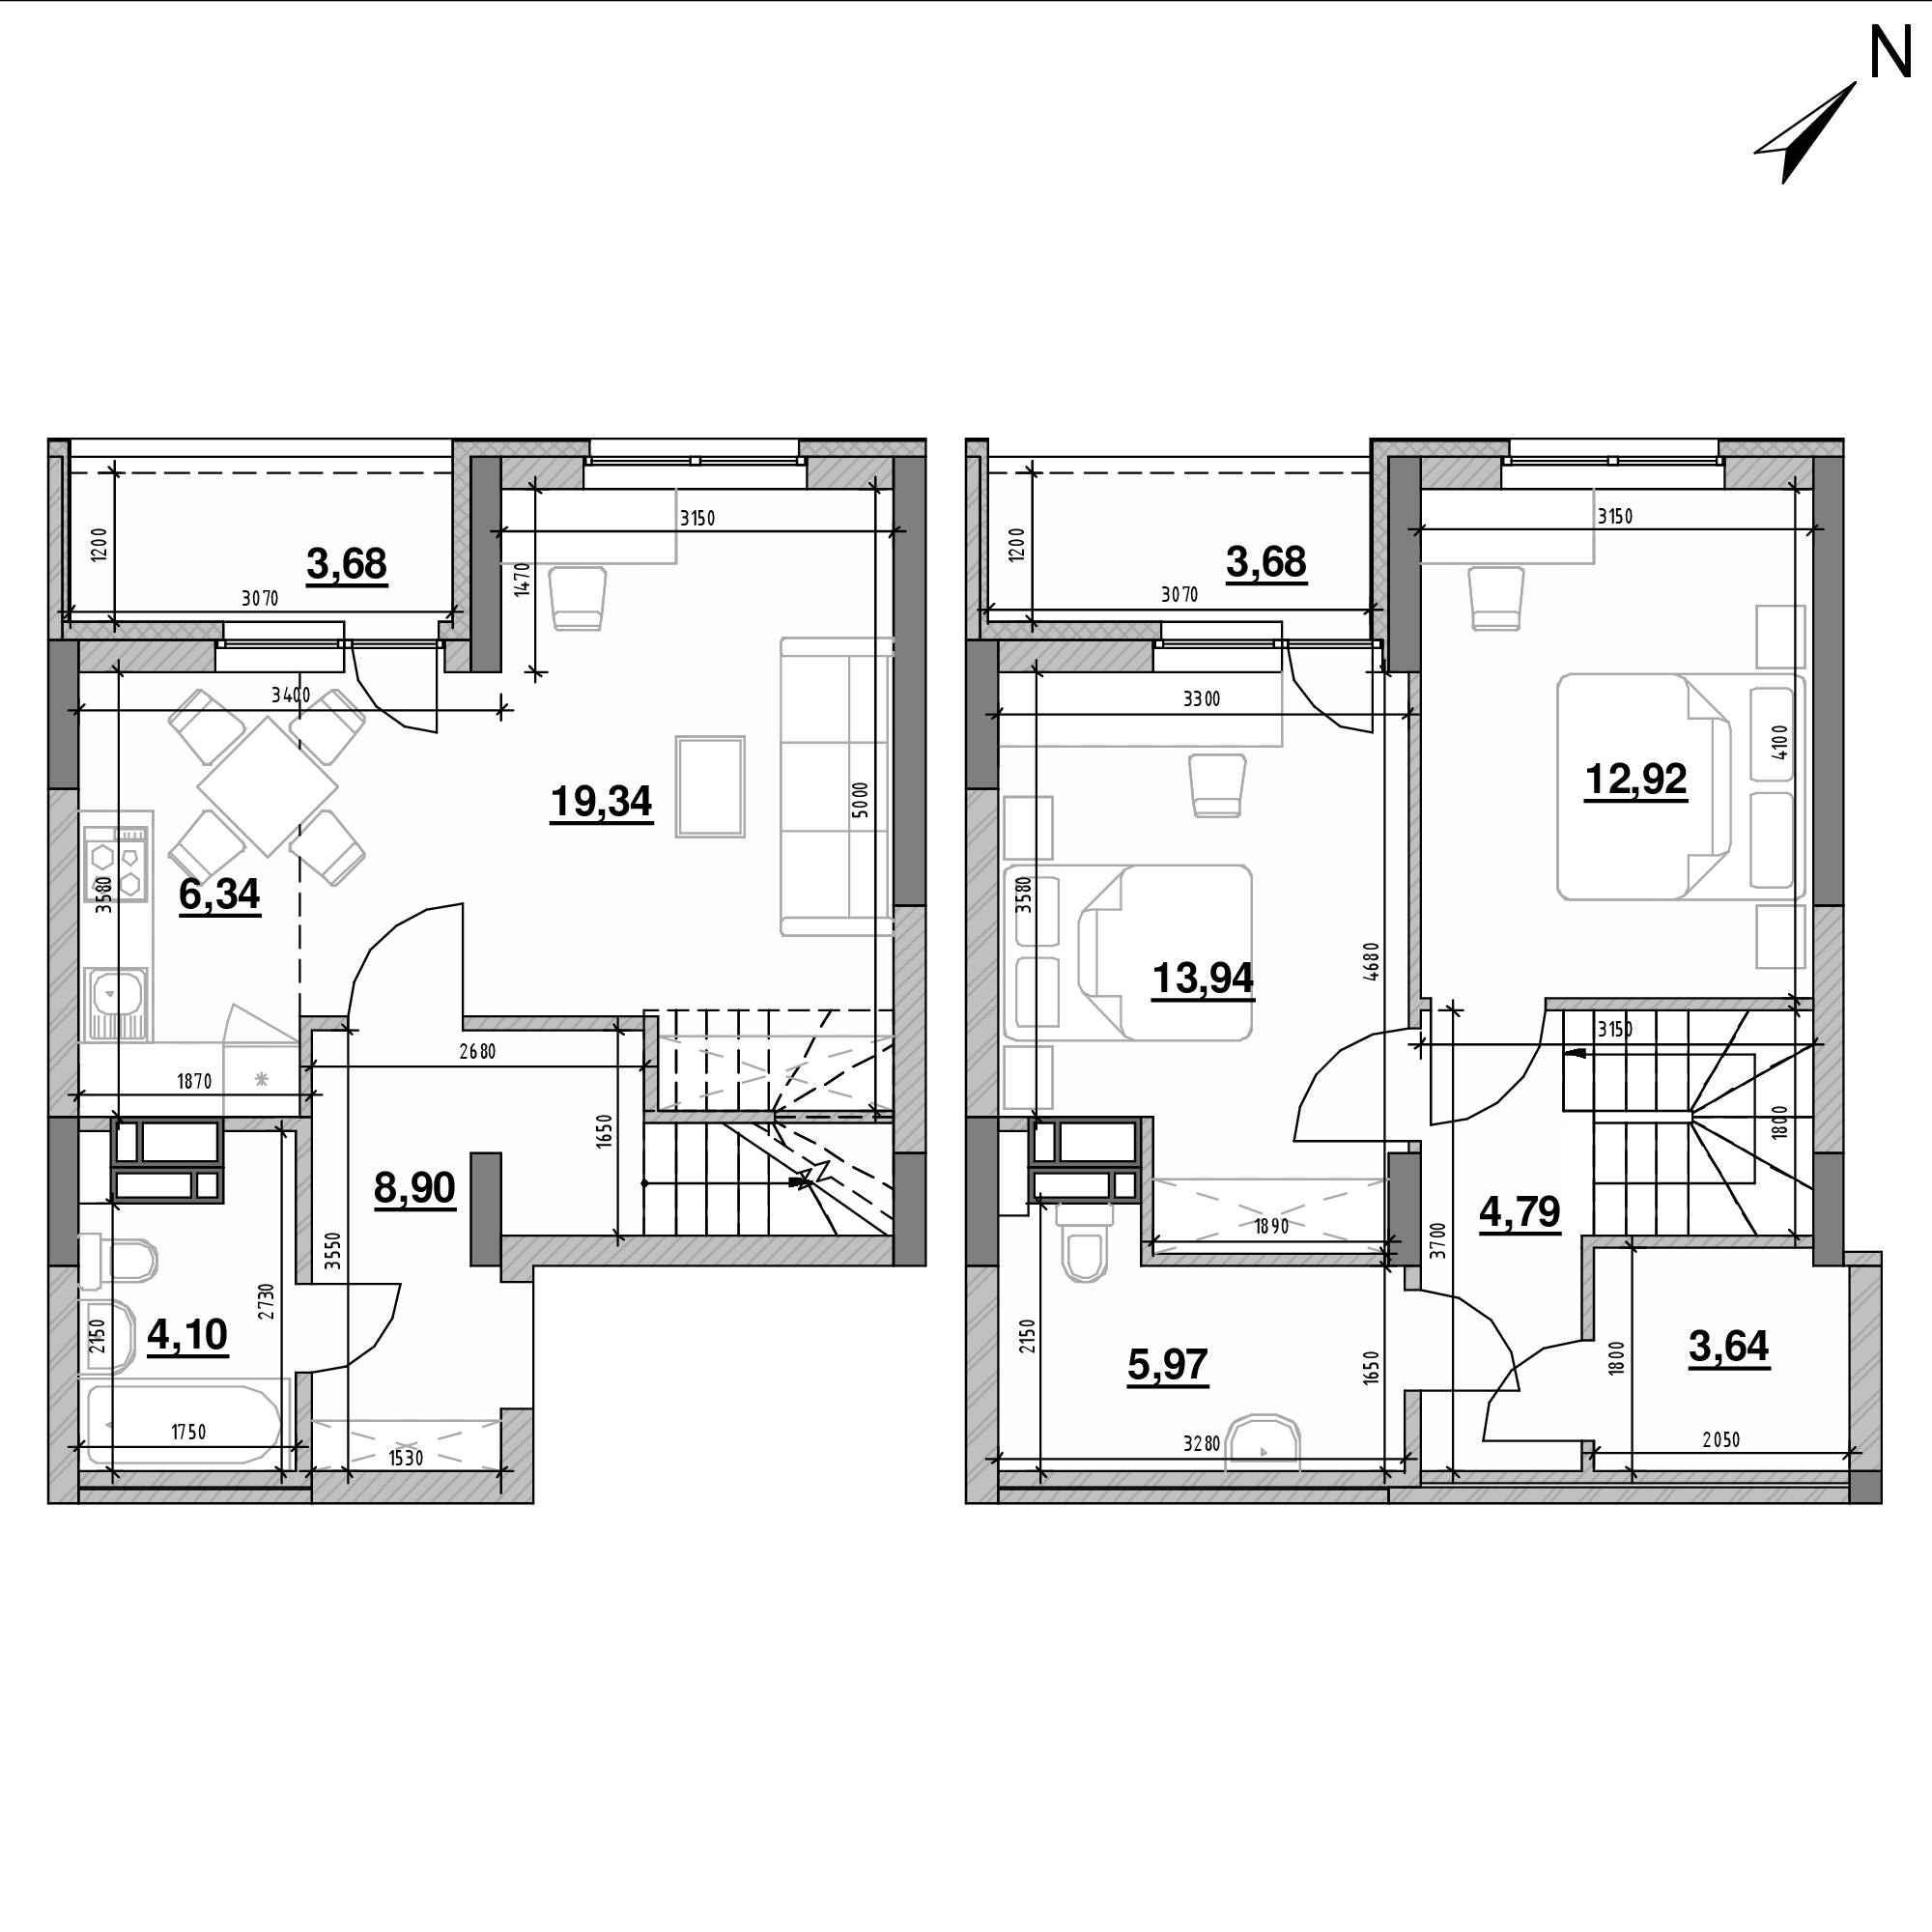 ЖК Оk'Land: планування 3-кімнатної квартири, №457, 87.3 м<sup>2</sup>